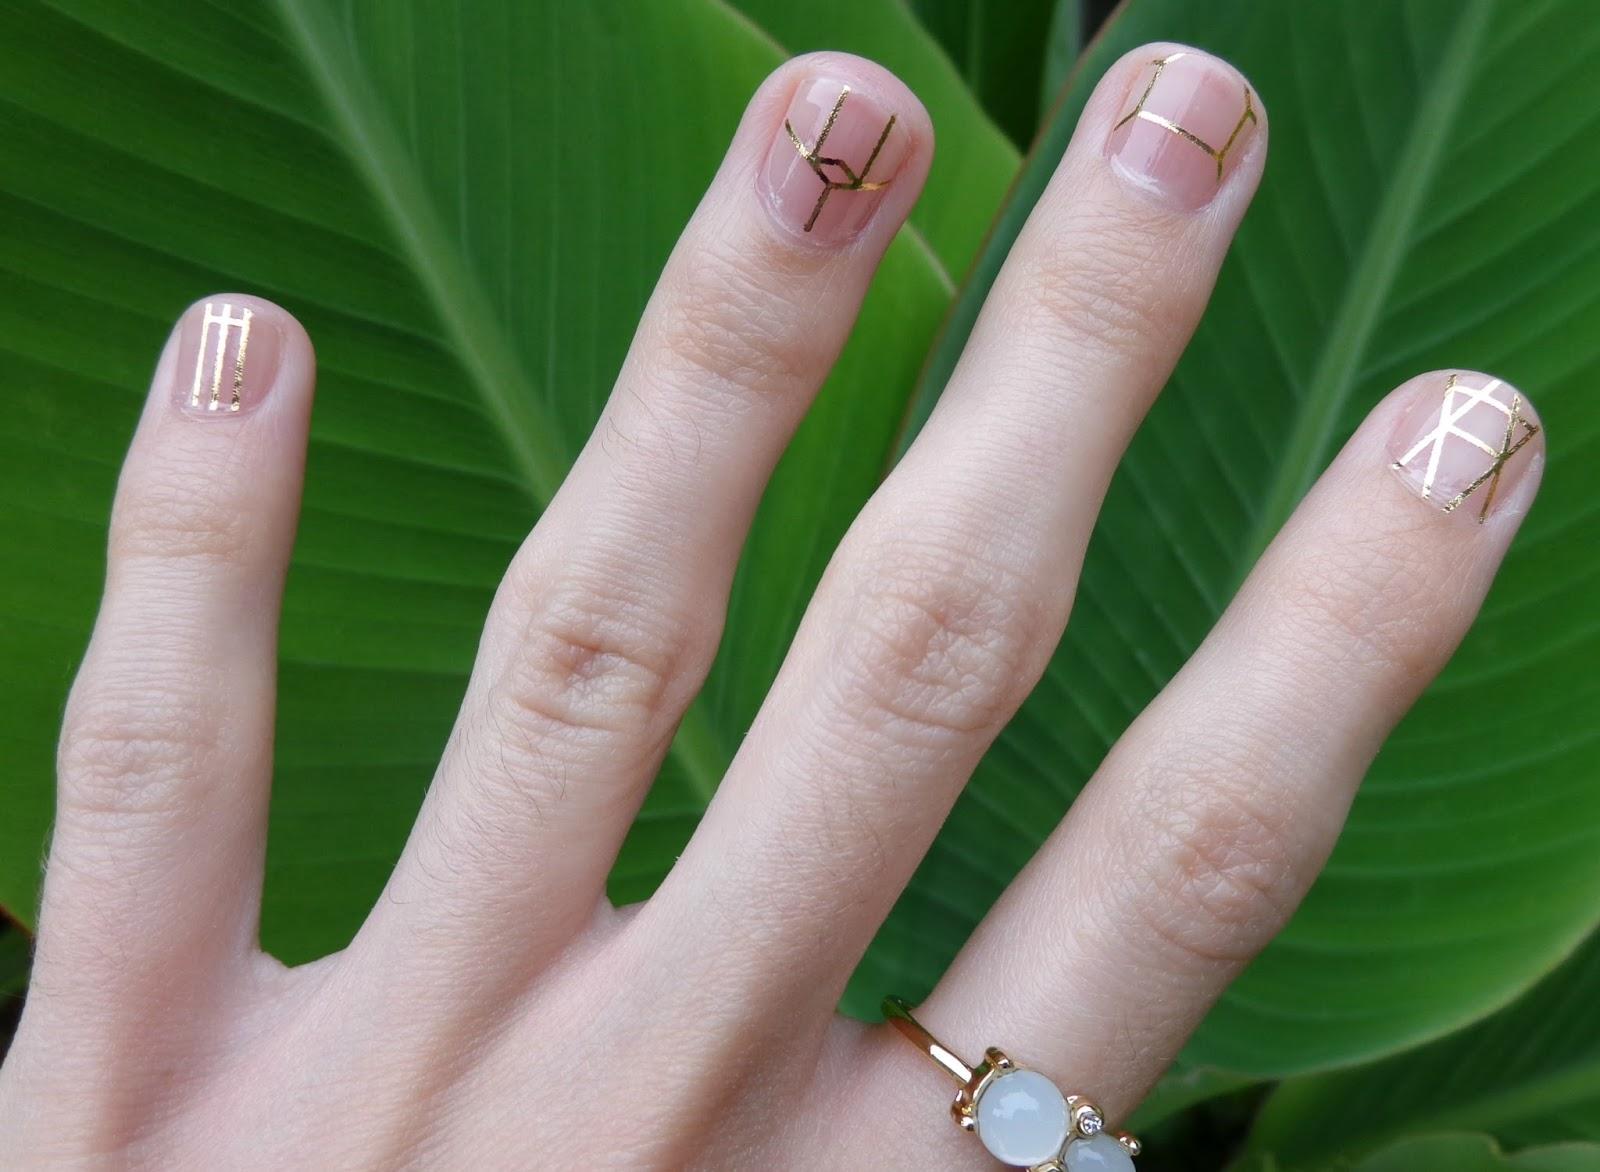 Simple Minimalist Geometric Nail Art